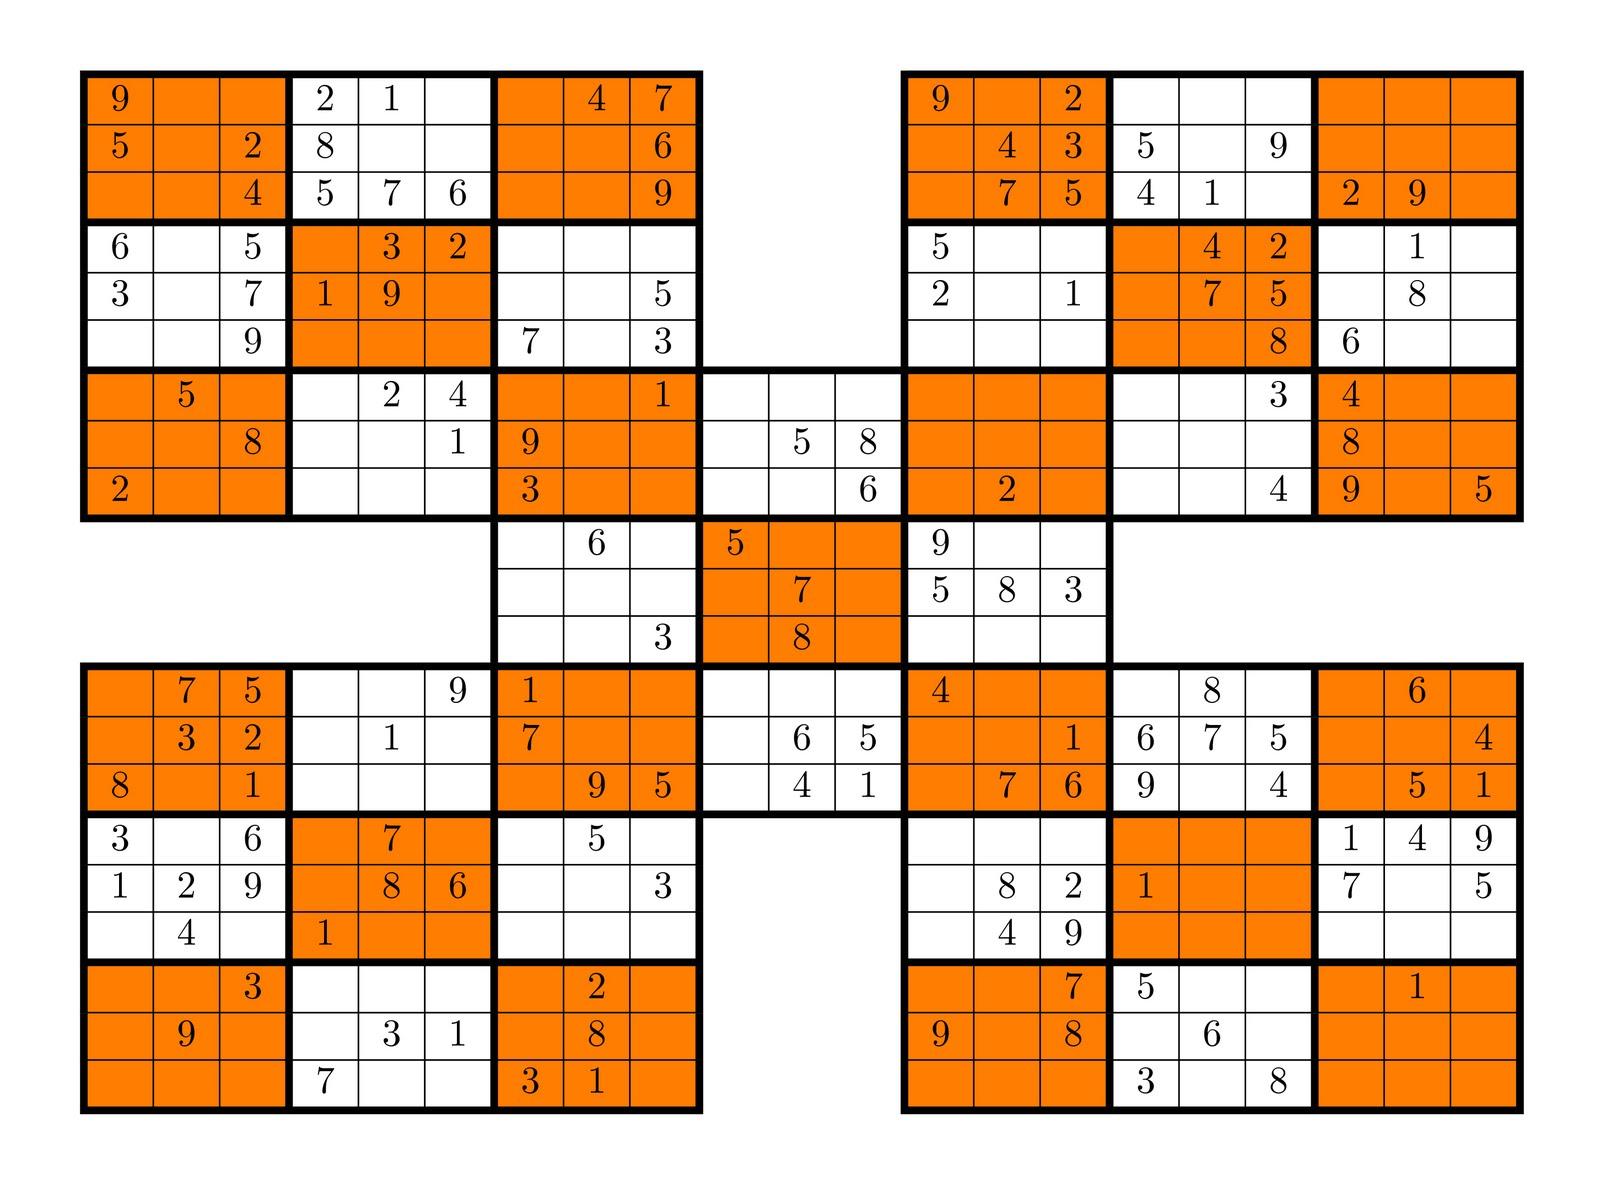 12 High Five Sudoku 9 X 9_10 on 2010 11 01 Archive